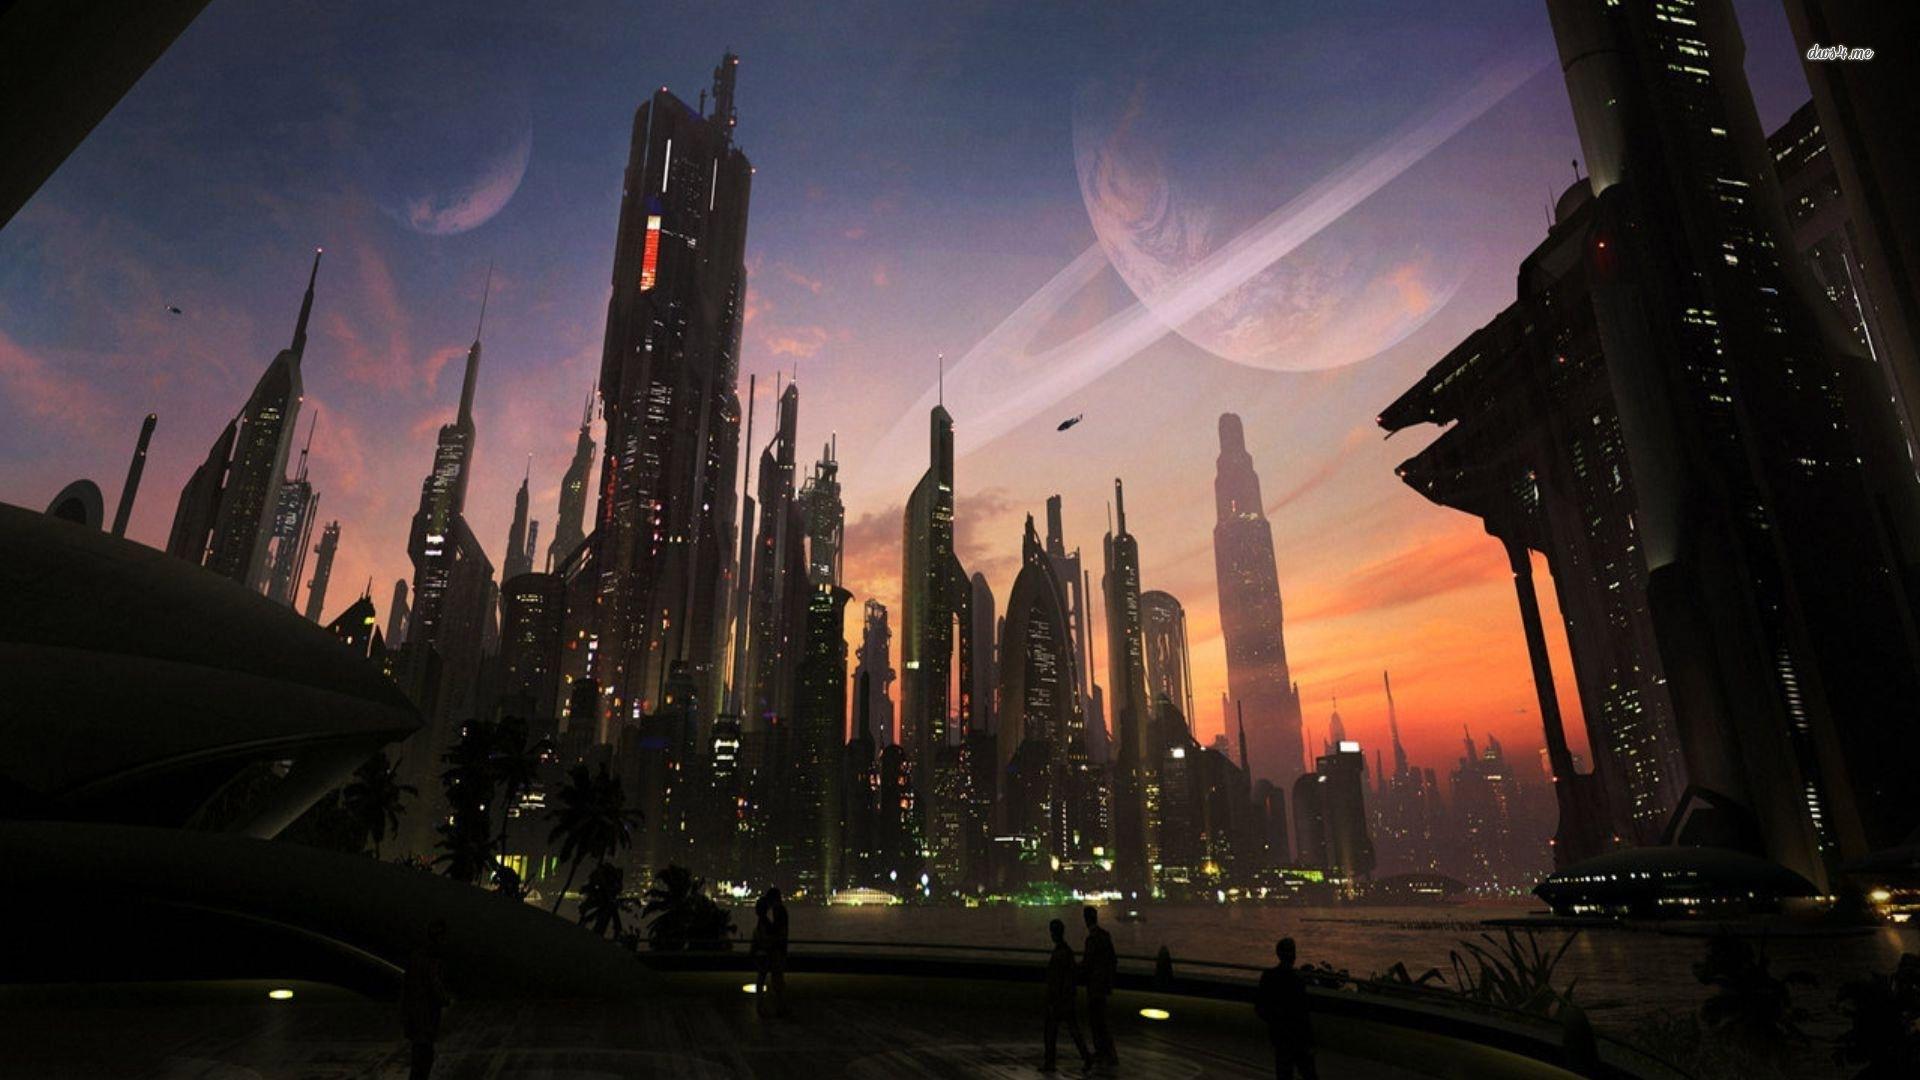 futureistic city - google search | concept art | pinterest